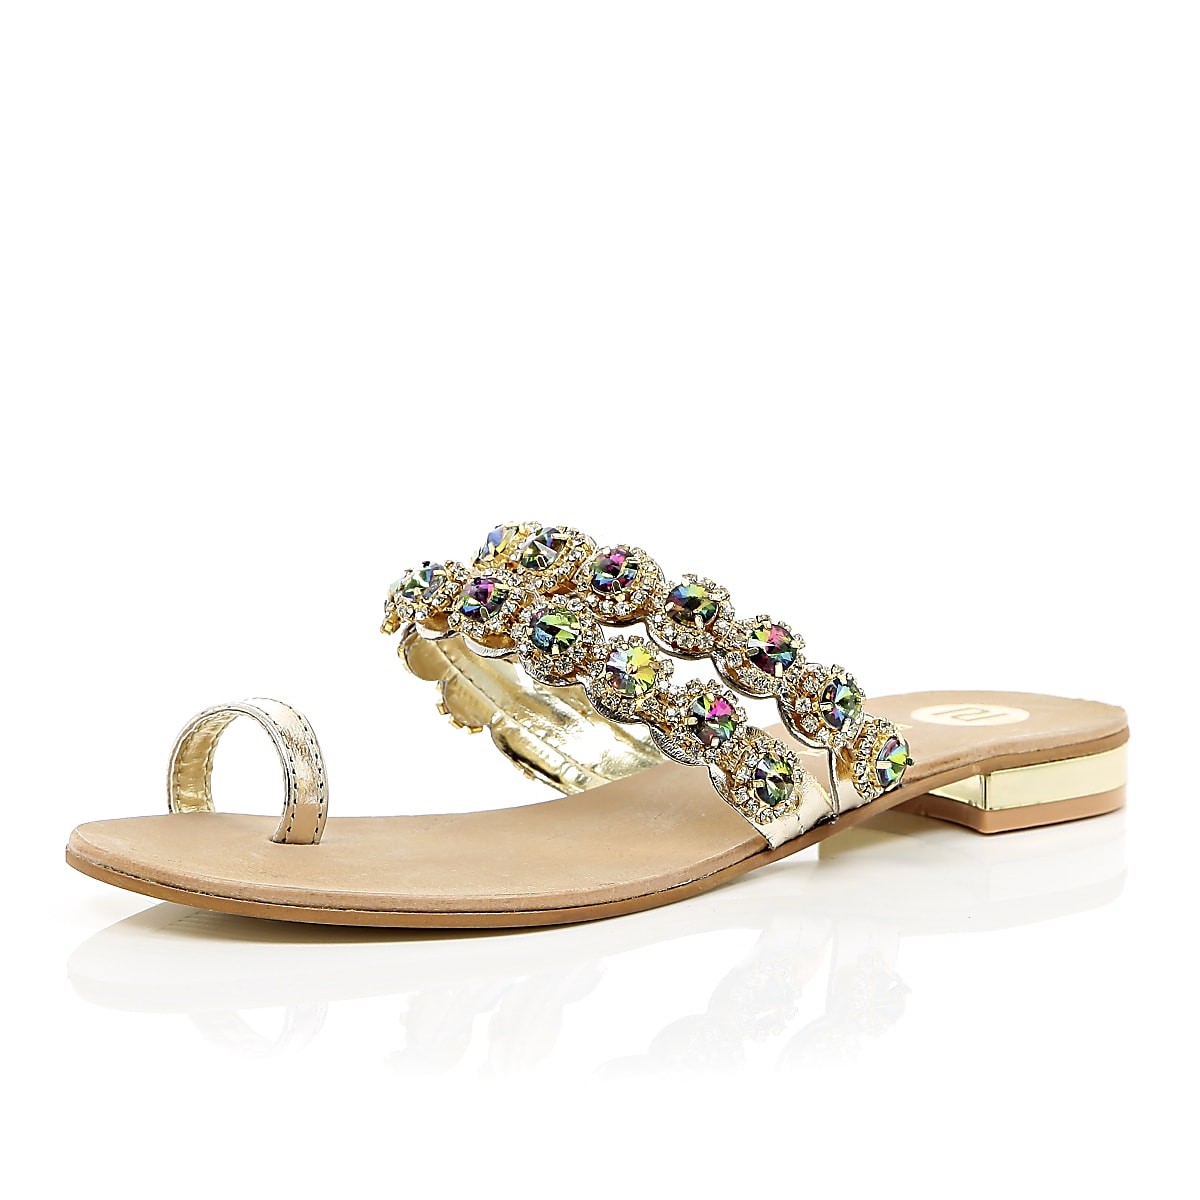 08aea988211 Gold gemstone embellished toe loop sandal - Sandals - Shoes   Boots - women